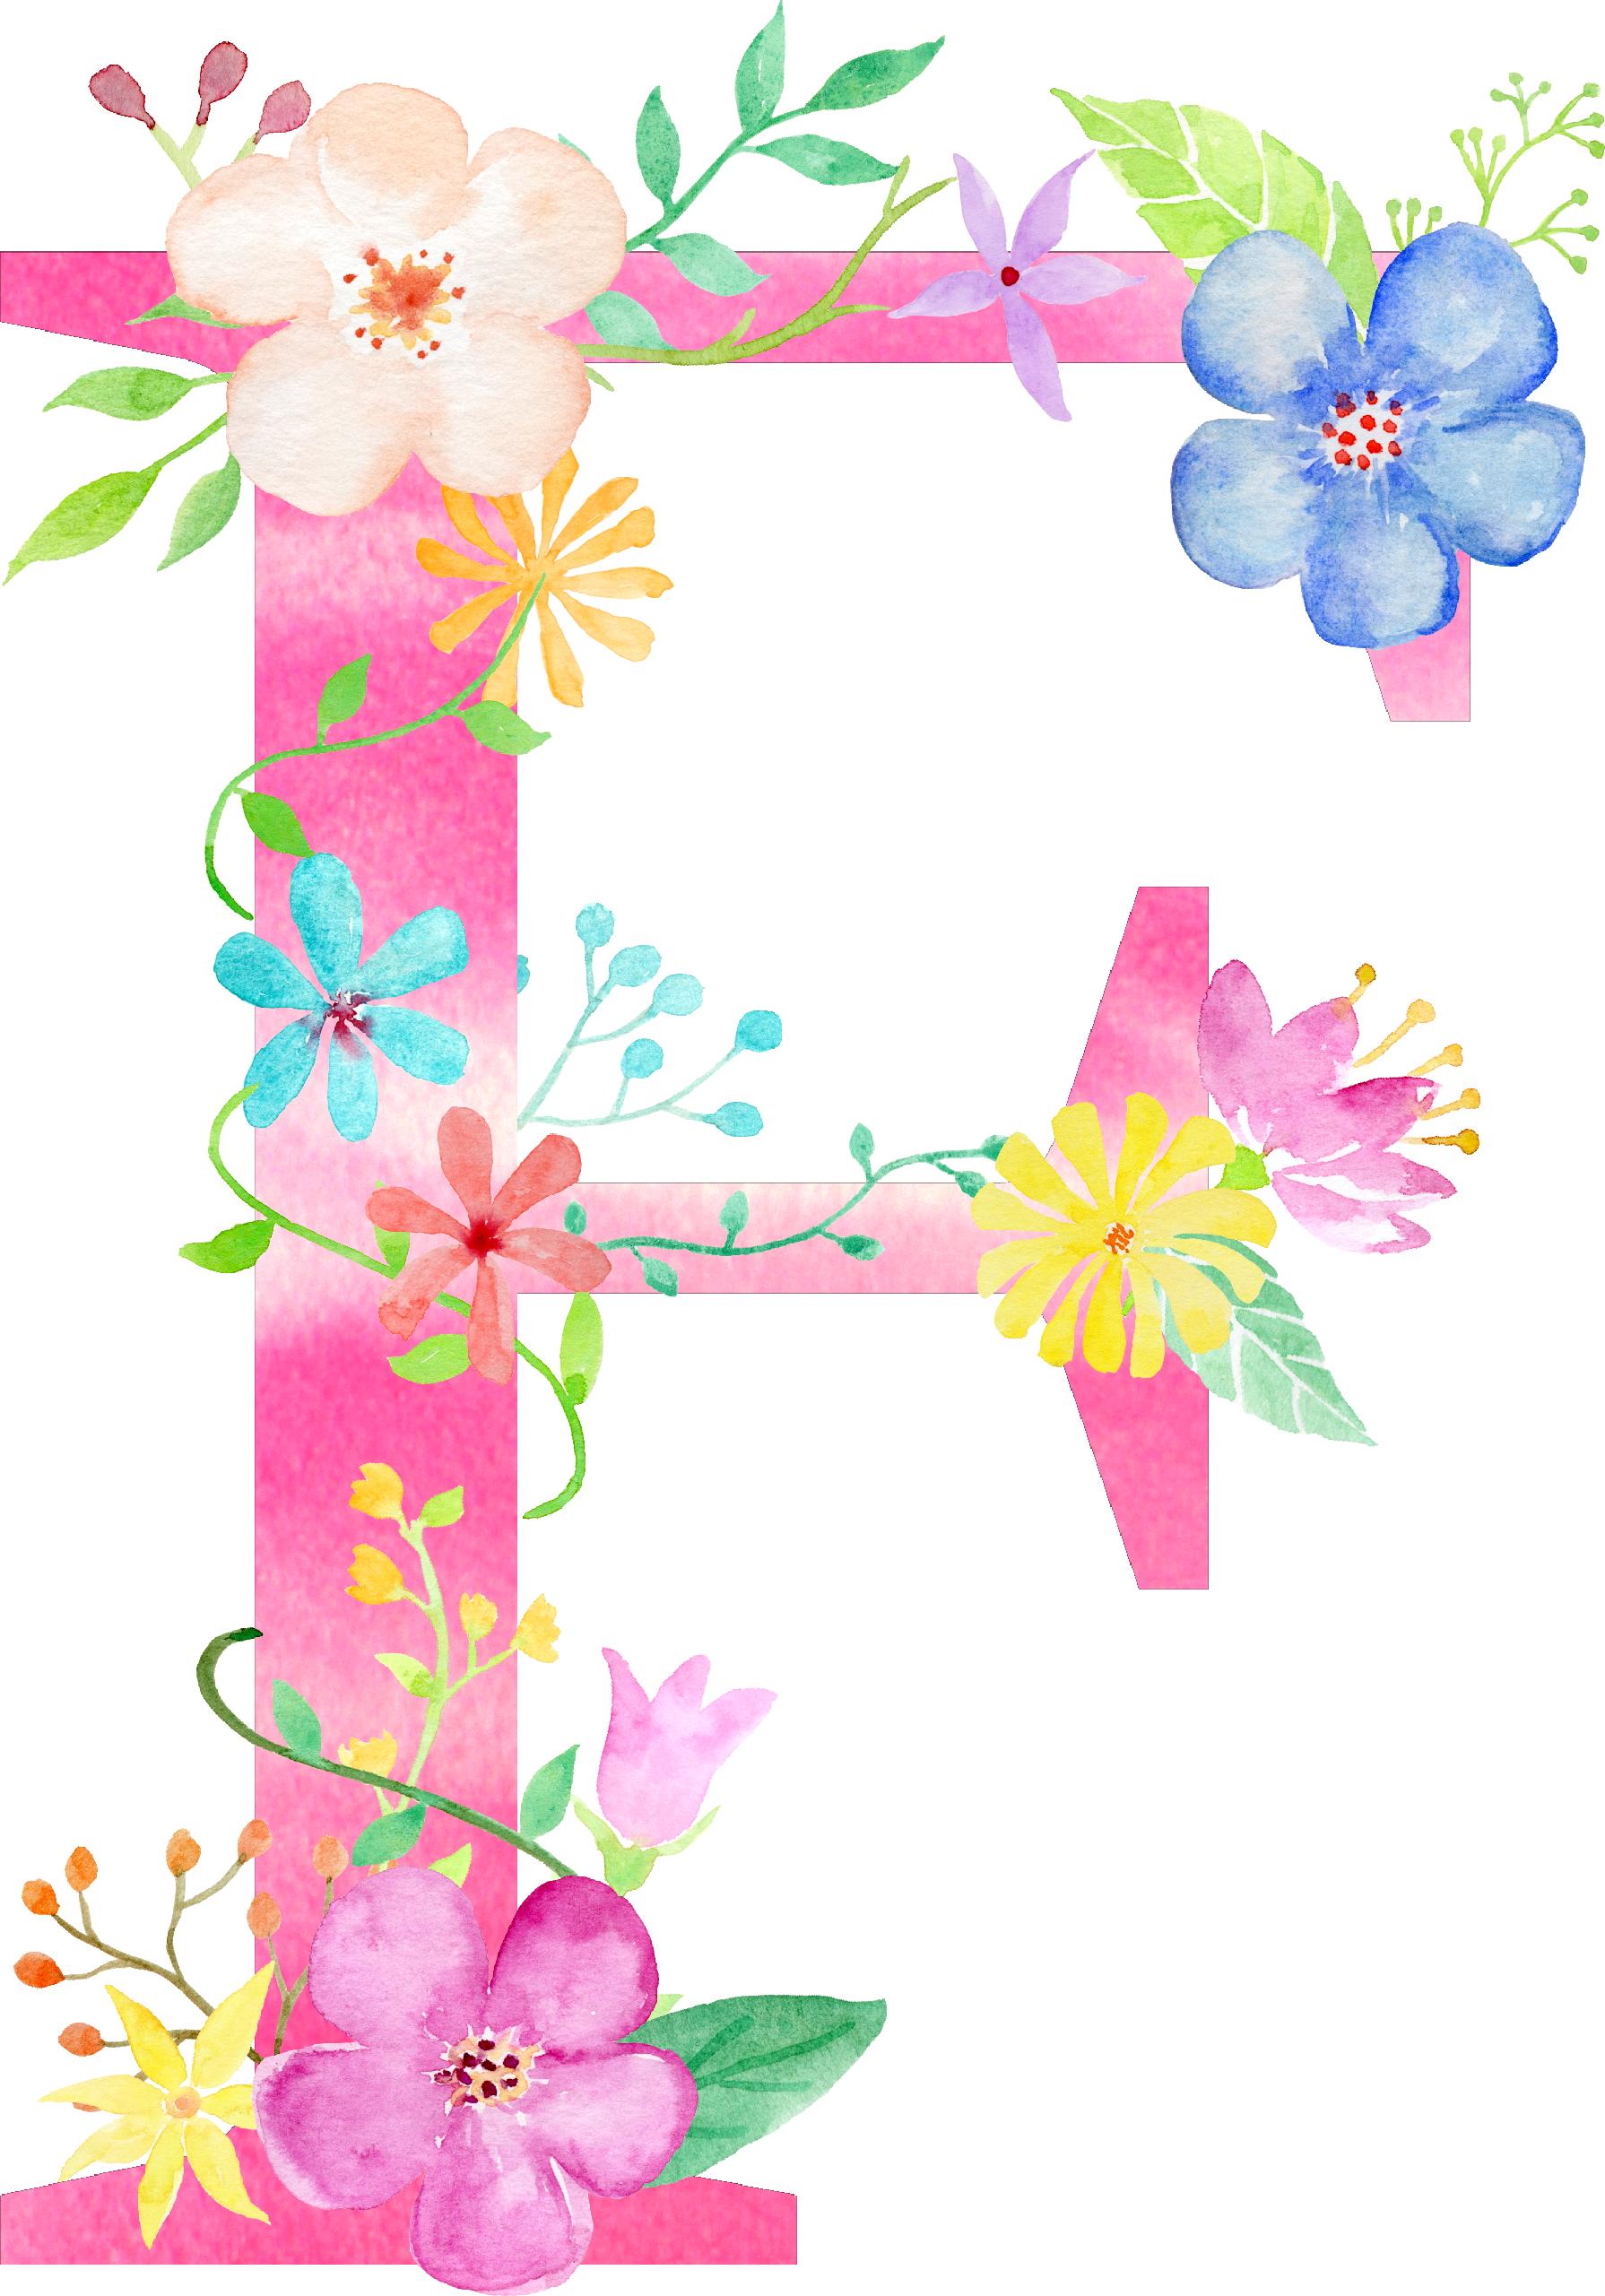 Pin by daro kampung on alphabet  bc2654b39f76